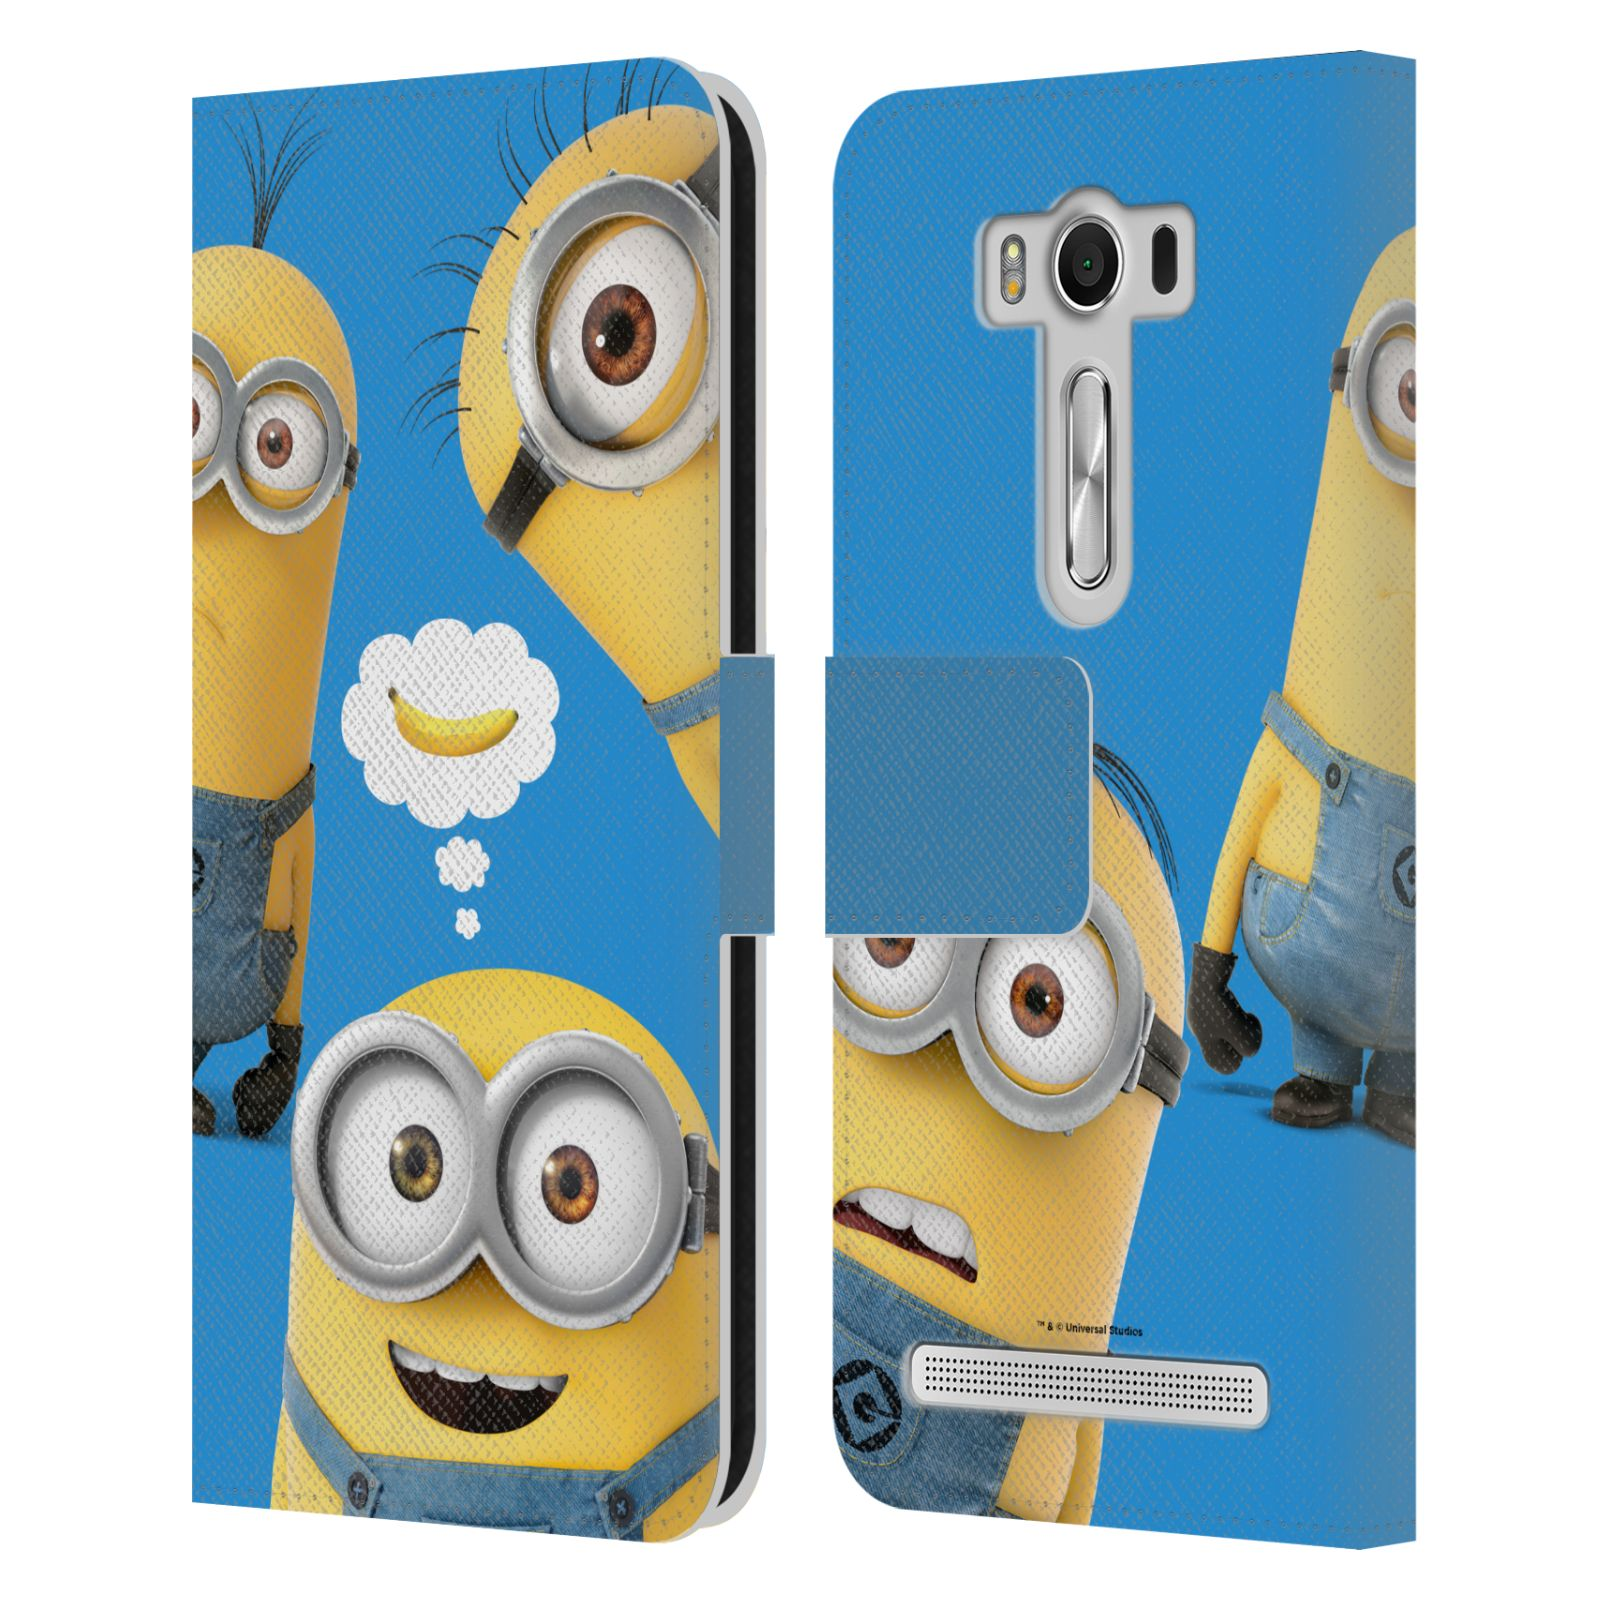 Pouzdro na mobil Asus Zenfone 2 Laser ZE500KL - Head Case - Mimoni - Tři mimoni a banán